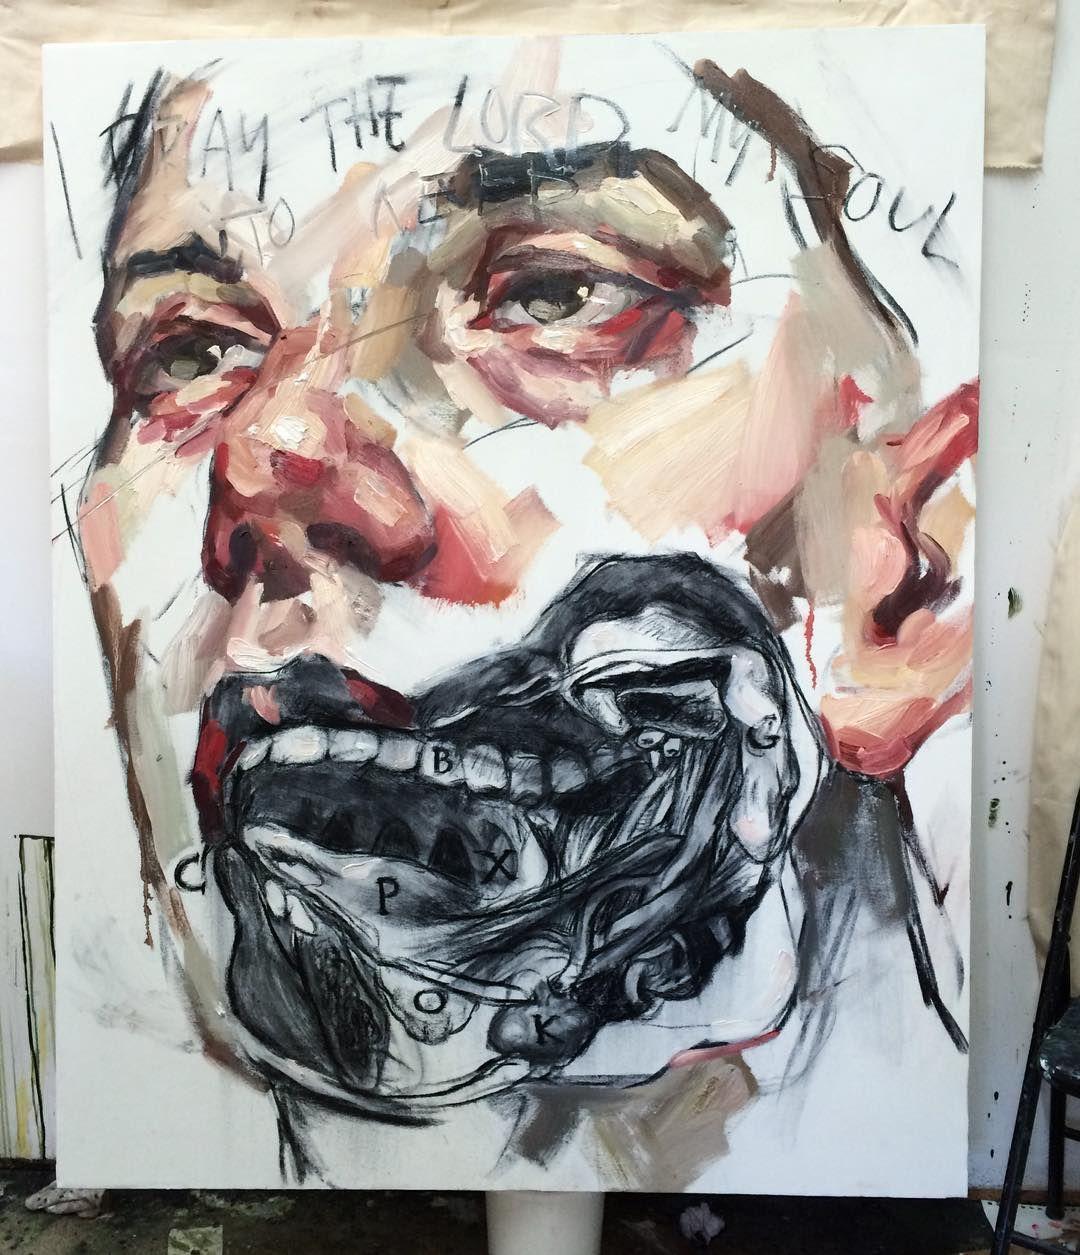 New 5ftx4ft piece, oil. Based on an illustration in my anatomy book, Traité D'Anatomie Topographique, ou Anatomie Des Régions du Corps Humain